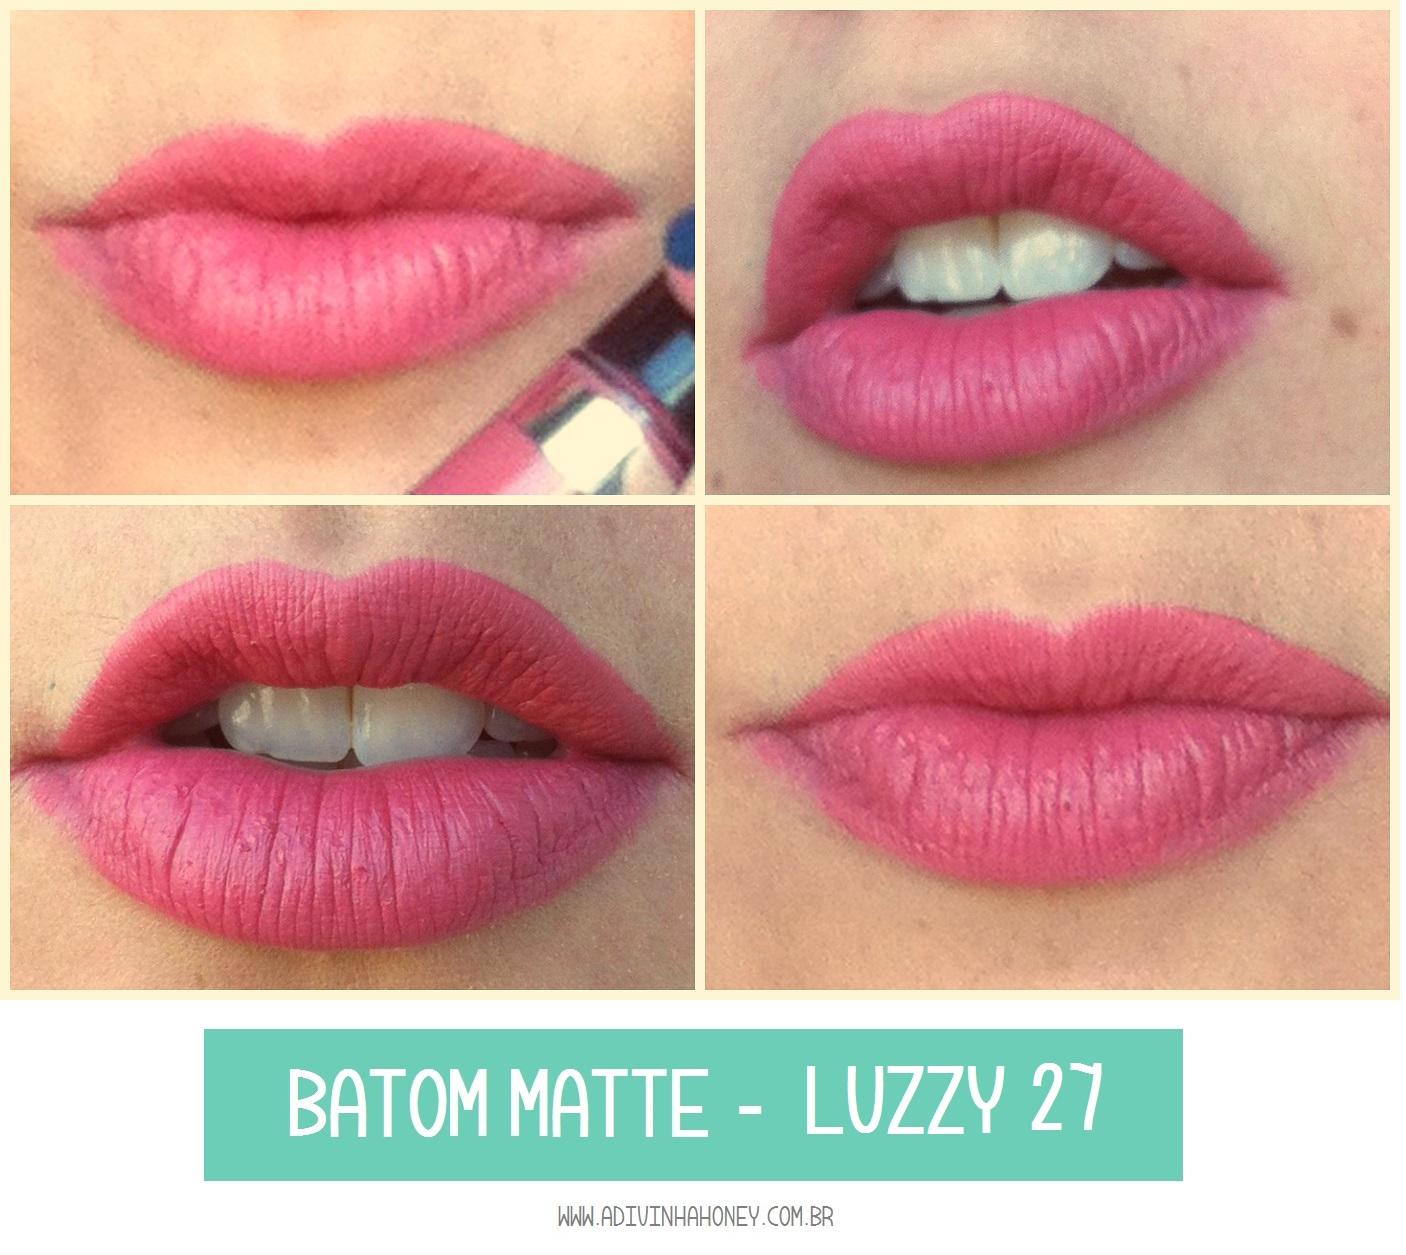 BATOM MATTE LUZZY